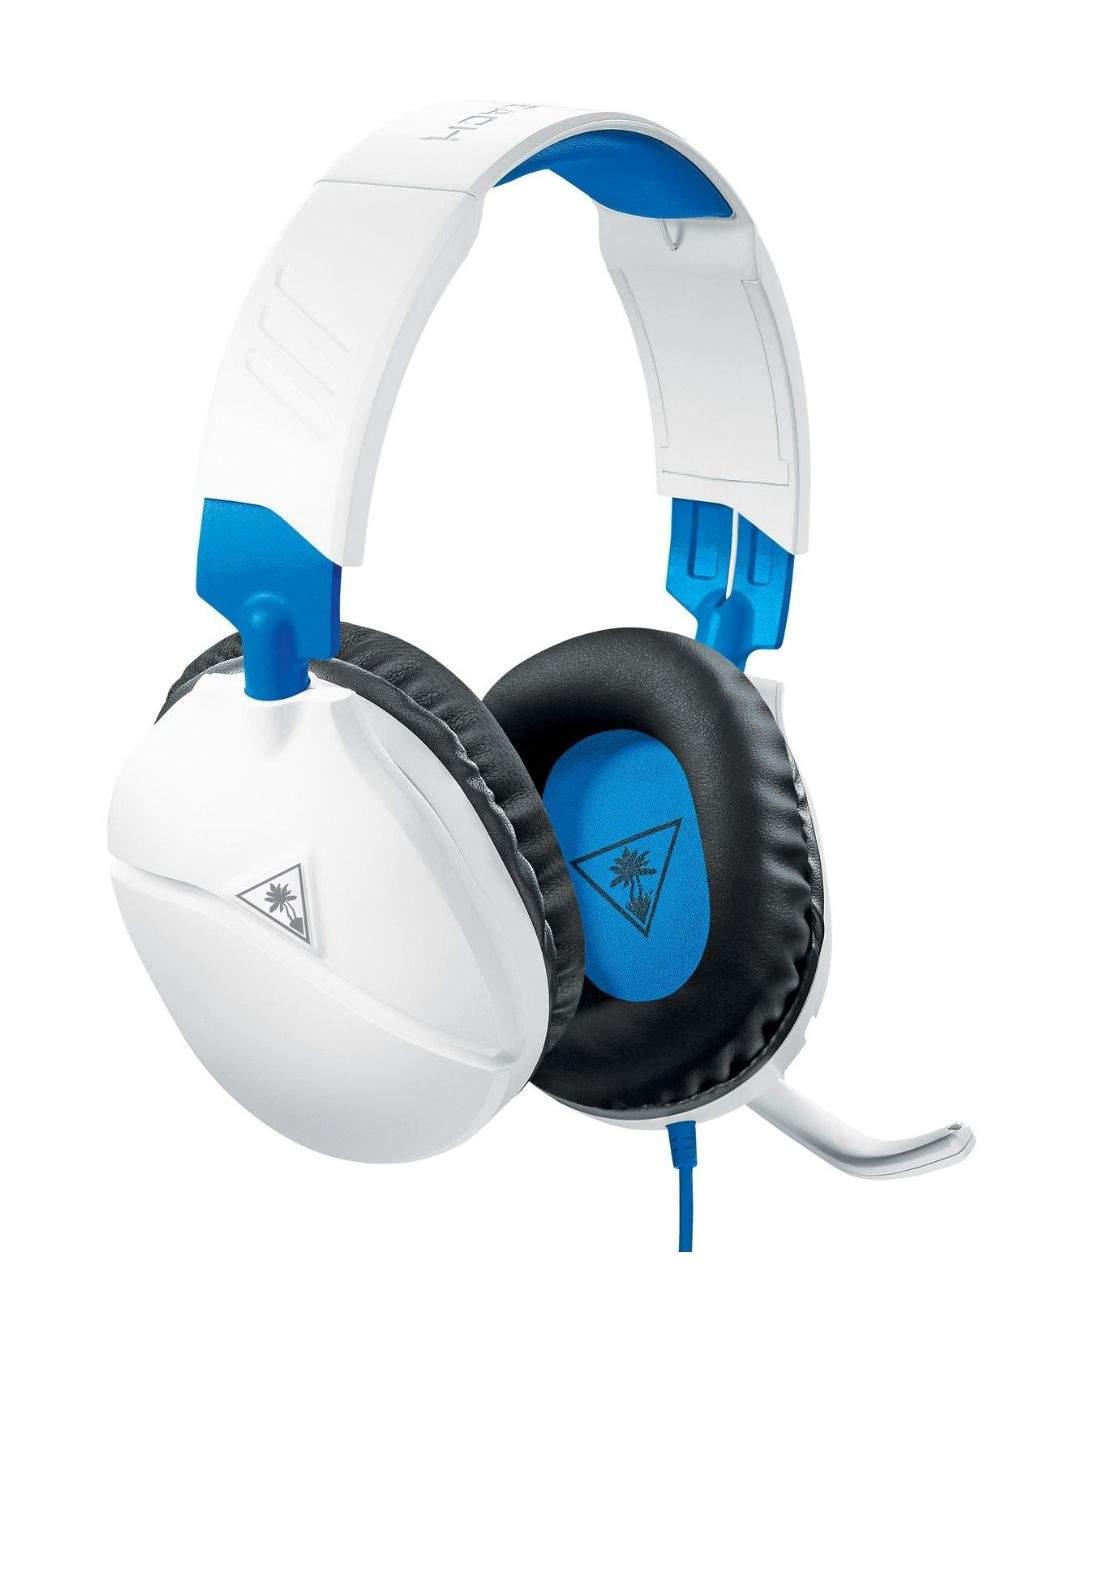 Turtle Beach Recon 70 gaming headset - White  سماعة